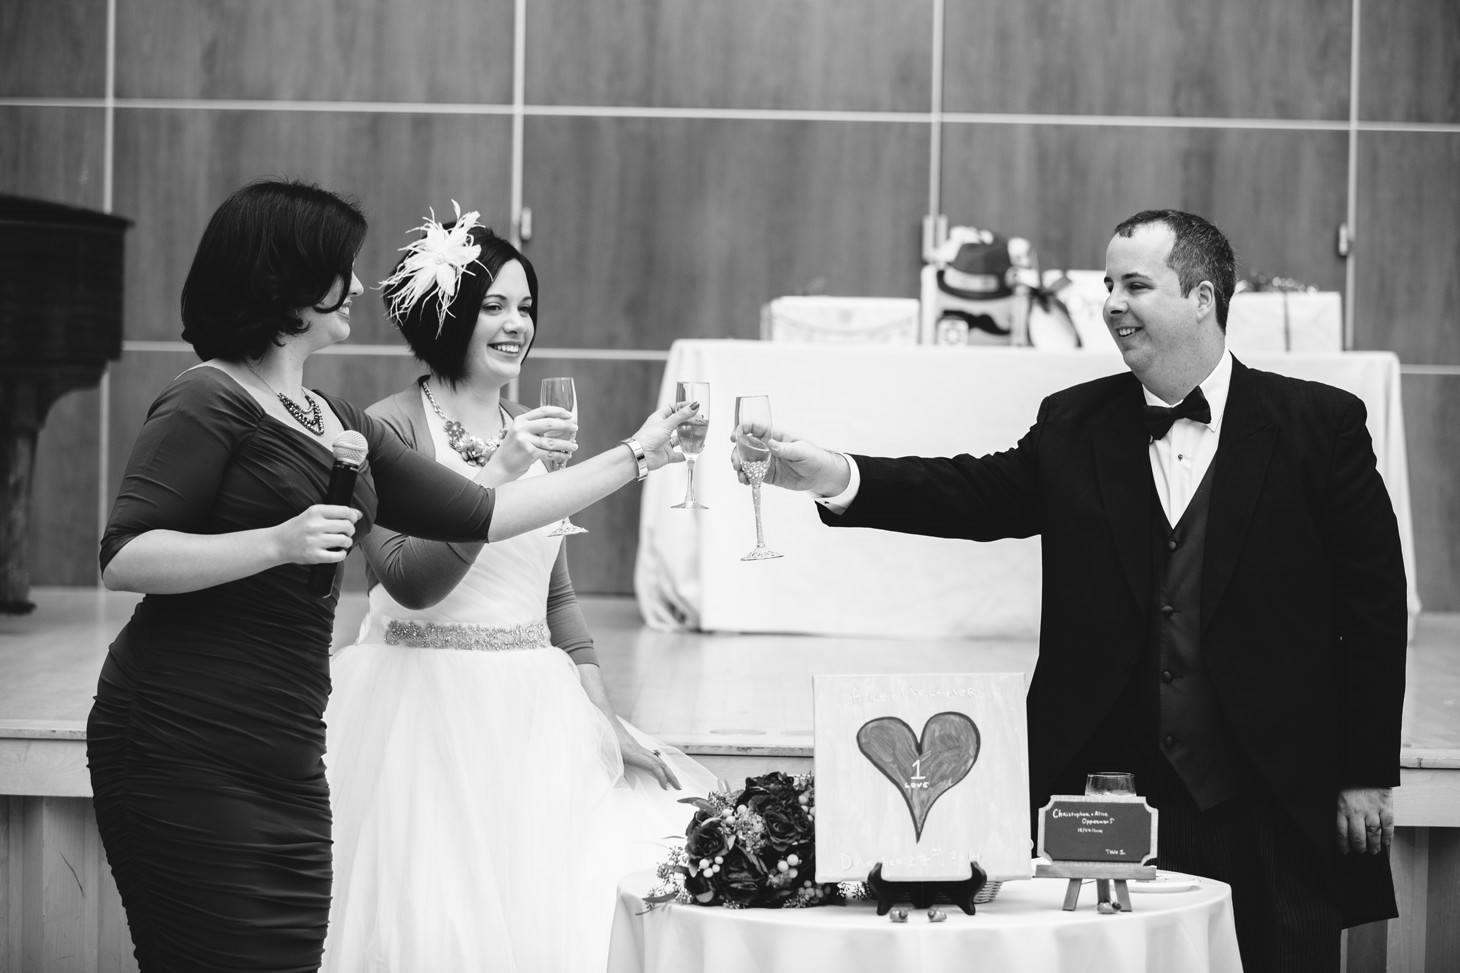 045-nyc-wedding-photographer-smitten-chickens-nj-montclair-art-museum.jpg